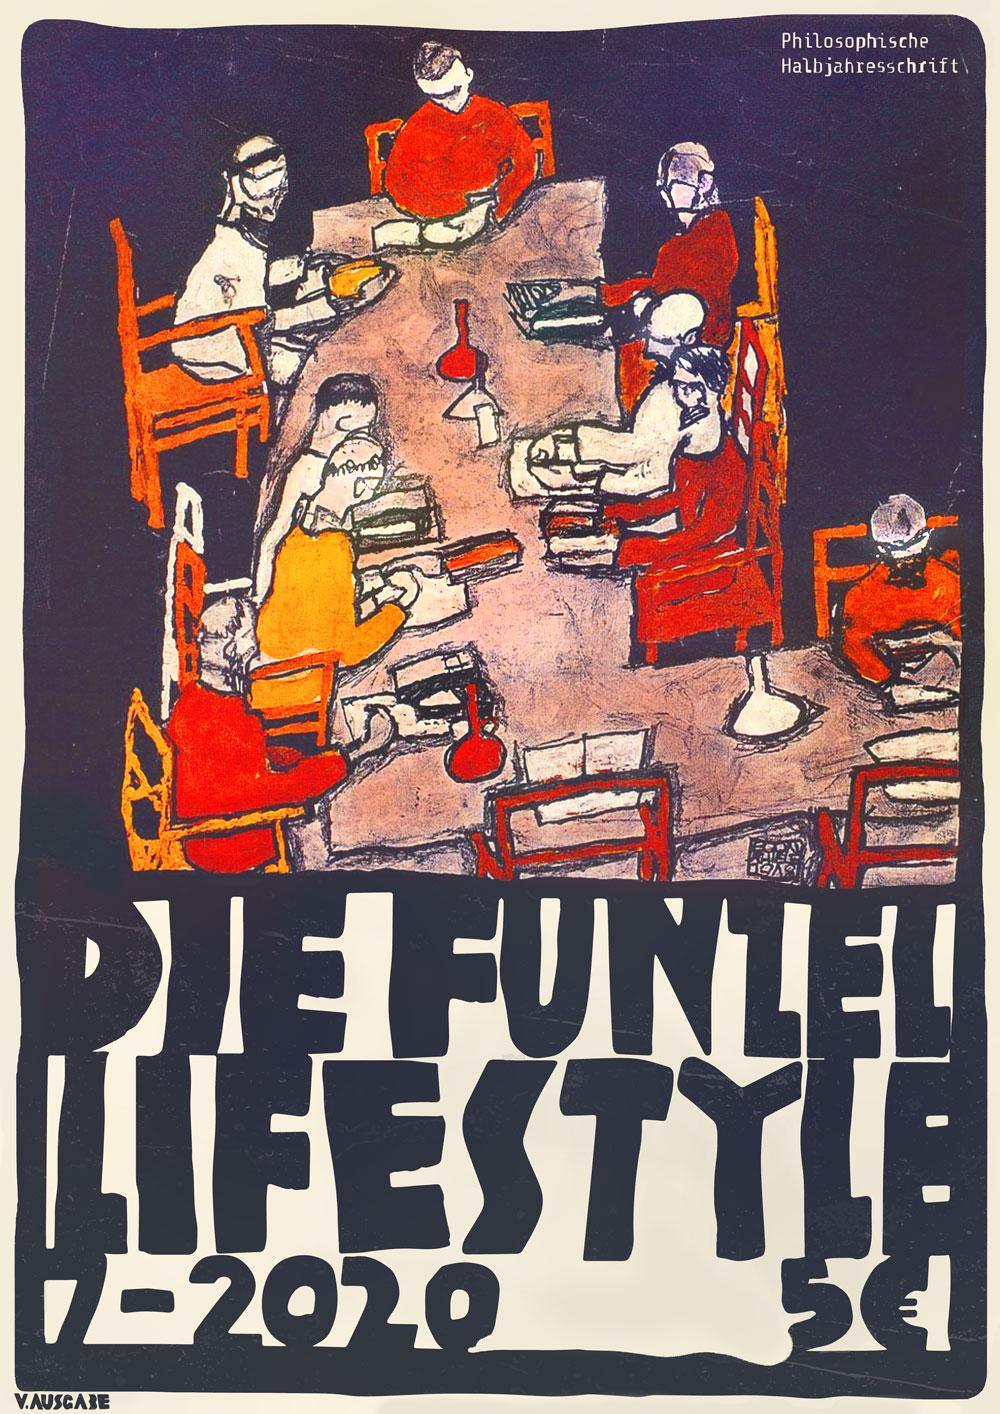 Lifestyle_Schiele-4_V1_final